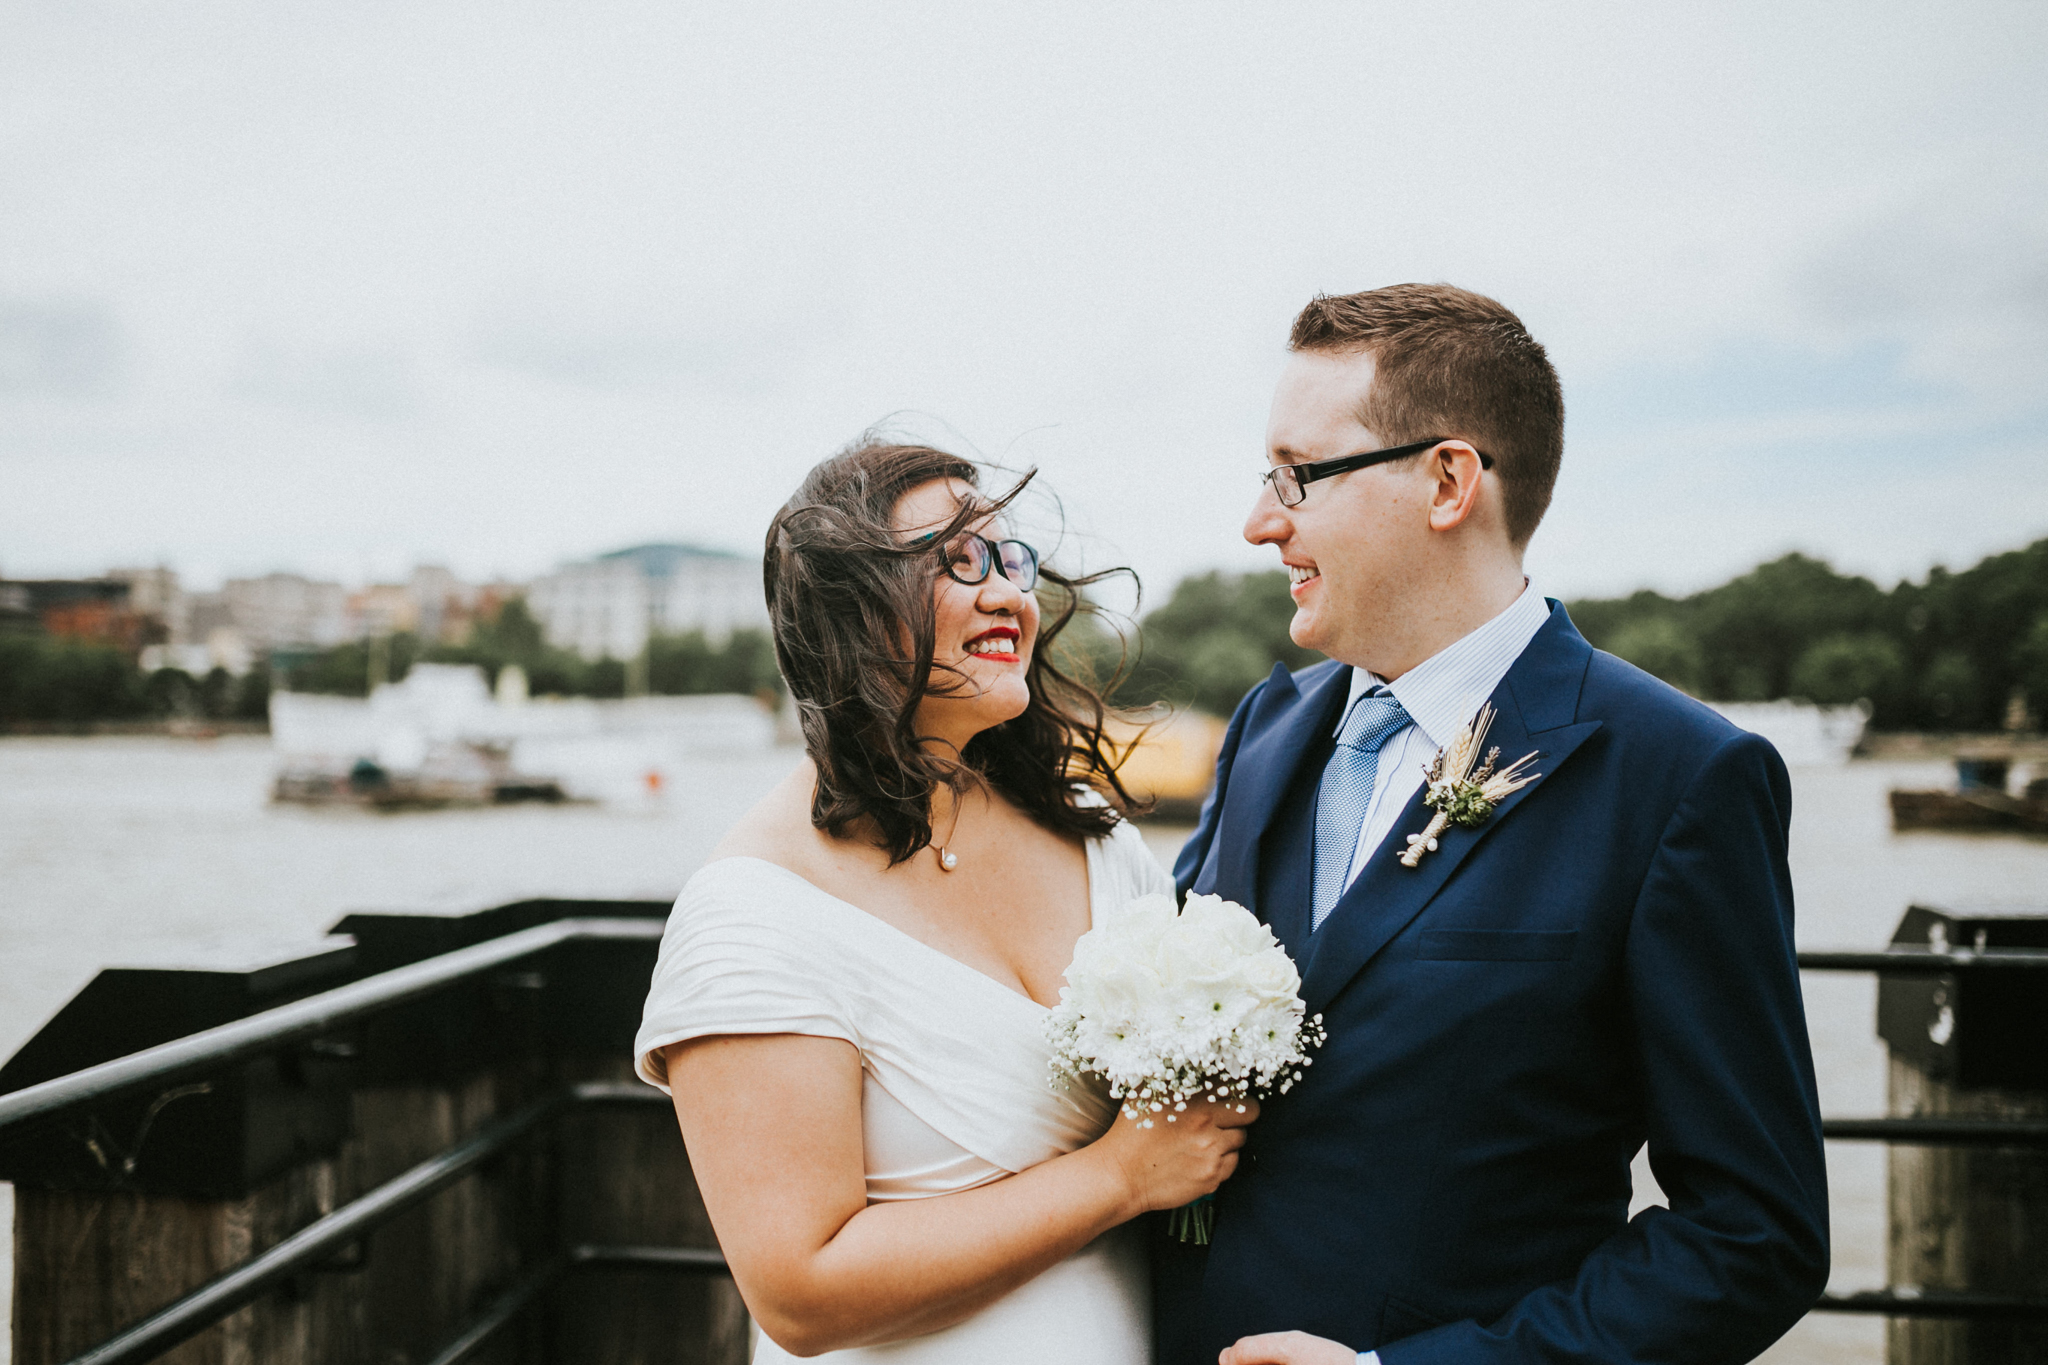 bride and groom couples potraits fun wedding photos in south bank london wedding photographer by destination london wedding photographer